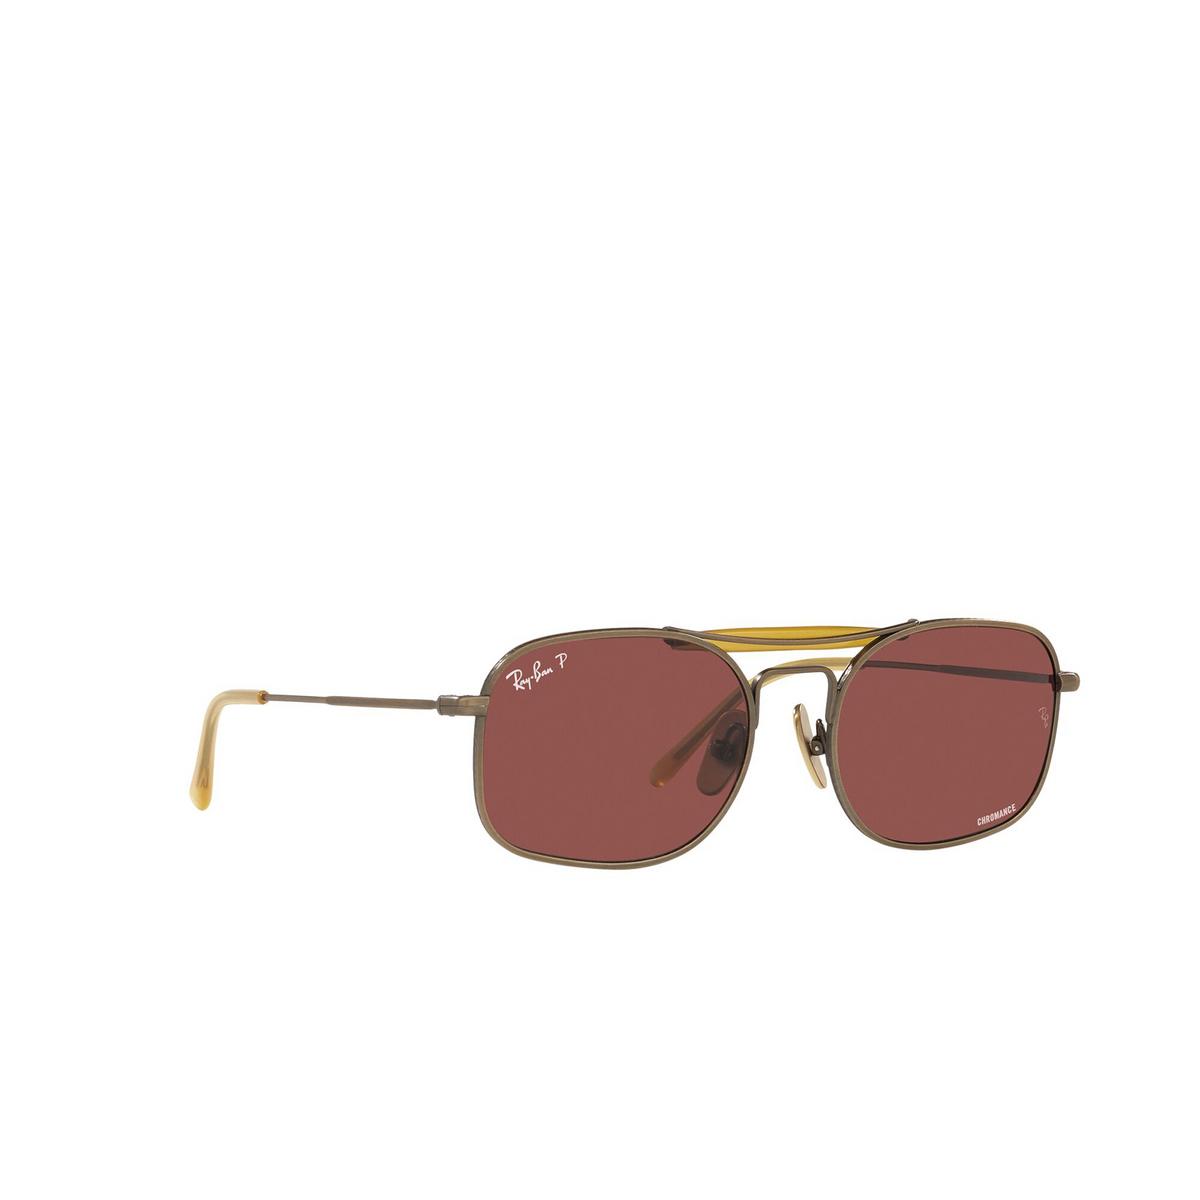 Ray-Ban® Square Sunglasses: RB8062 color Demi Gloss Antique Gold 9207AL - three-quarters view.